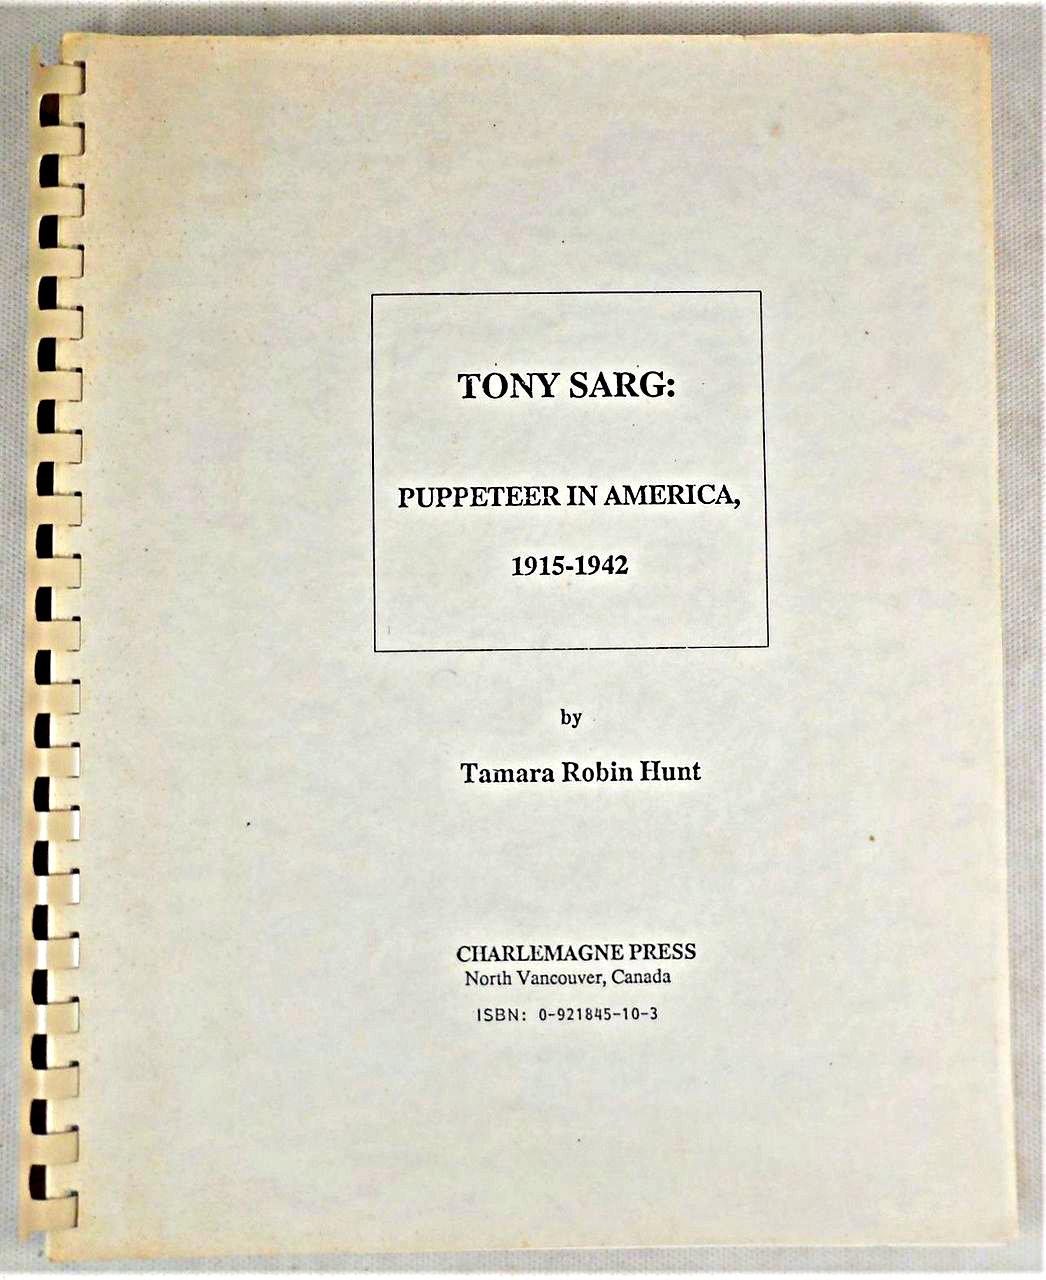 TONY SARG: PUPPETEER IN AMERICA 1915-1942, by Tamara Robin Hunt - 1988